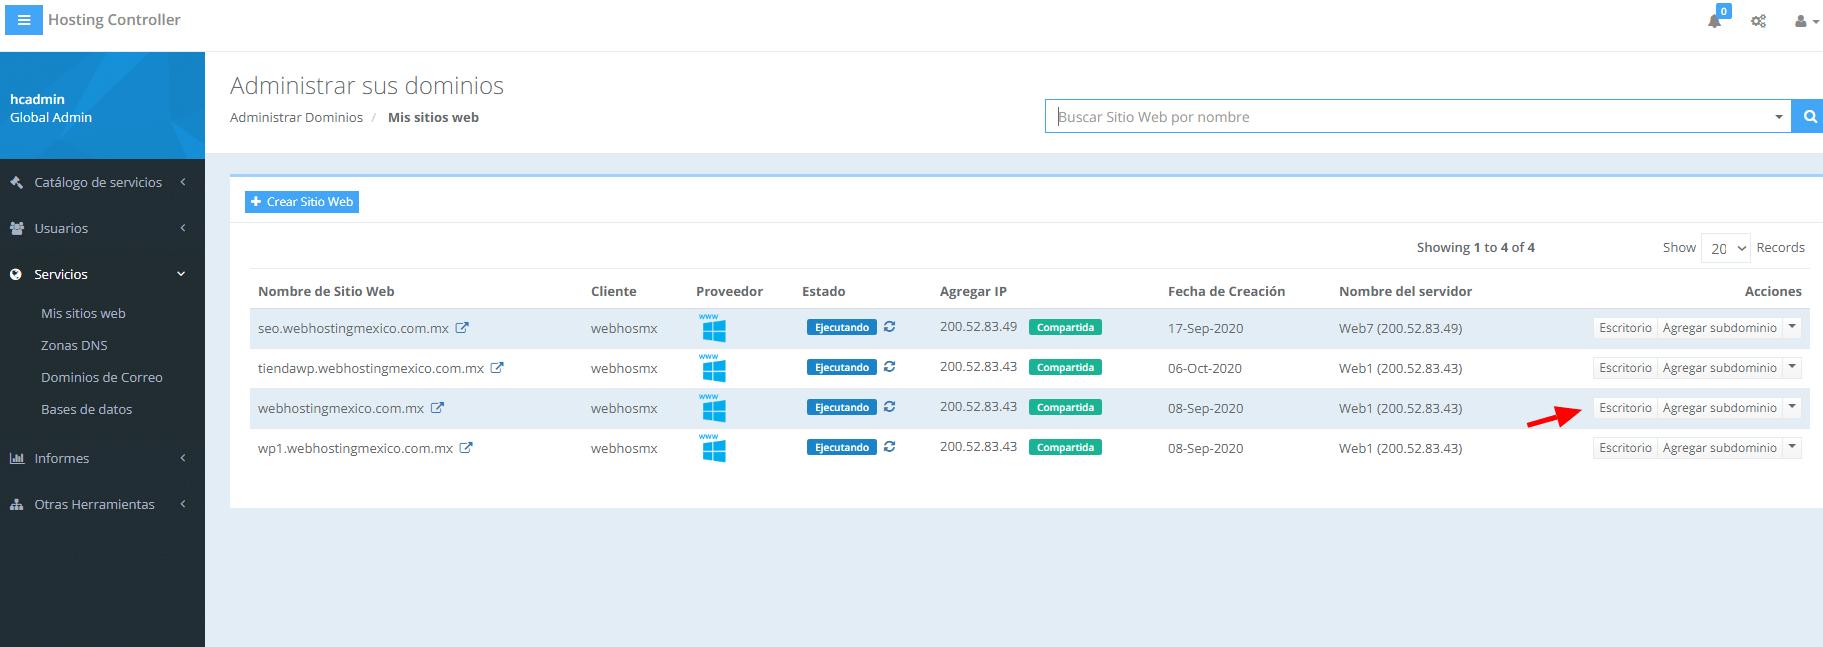 hosting controller escritorio